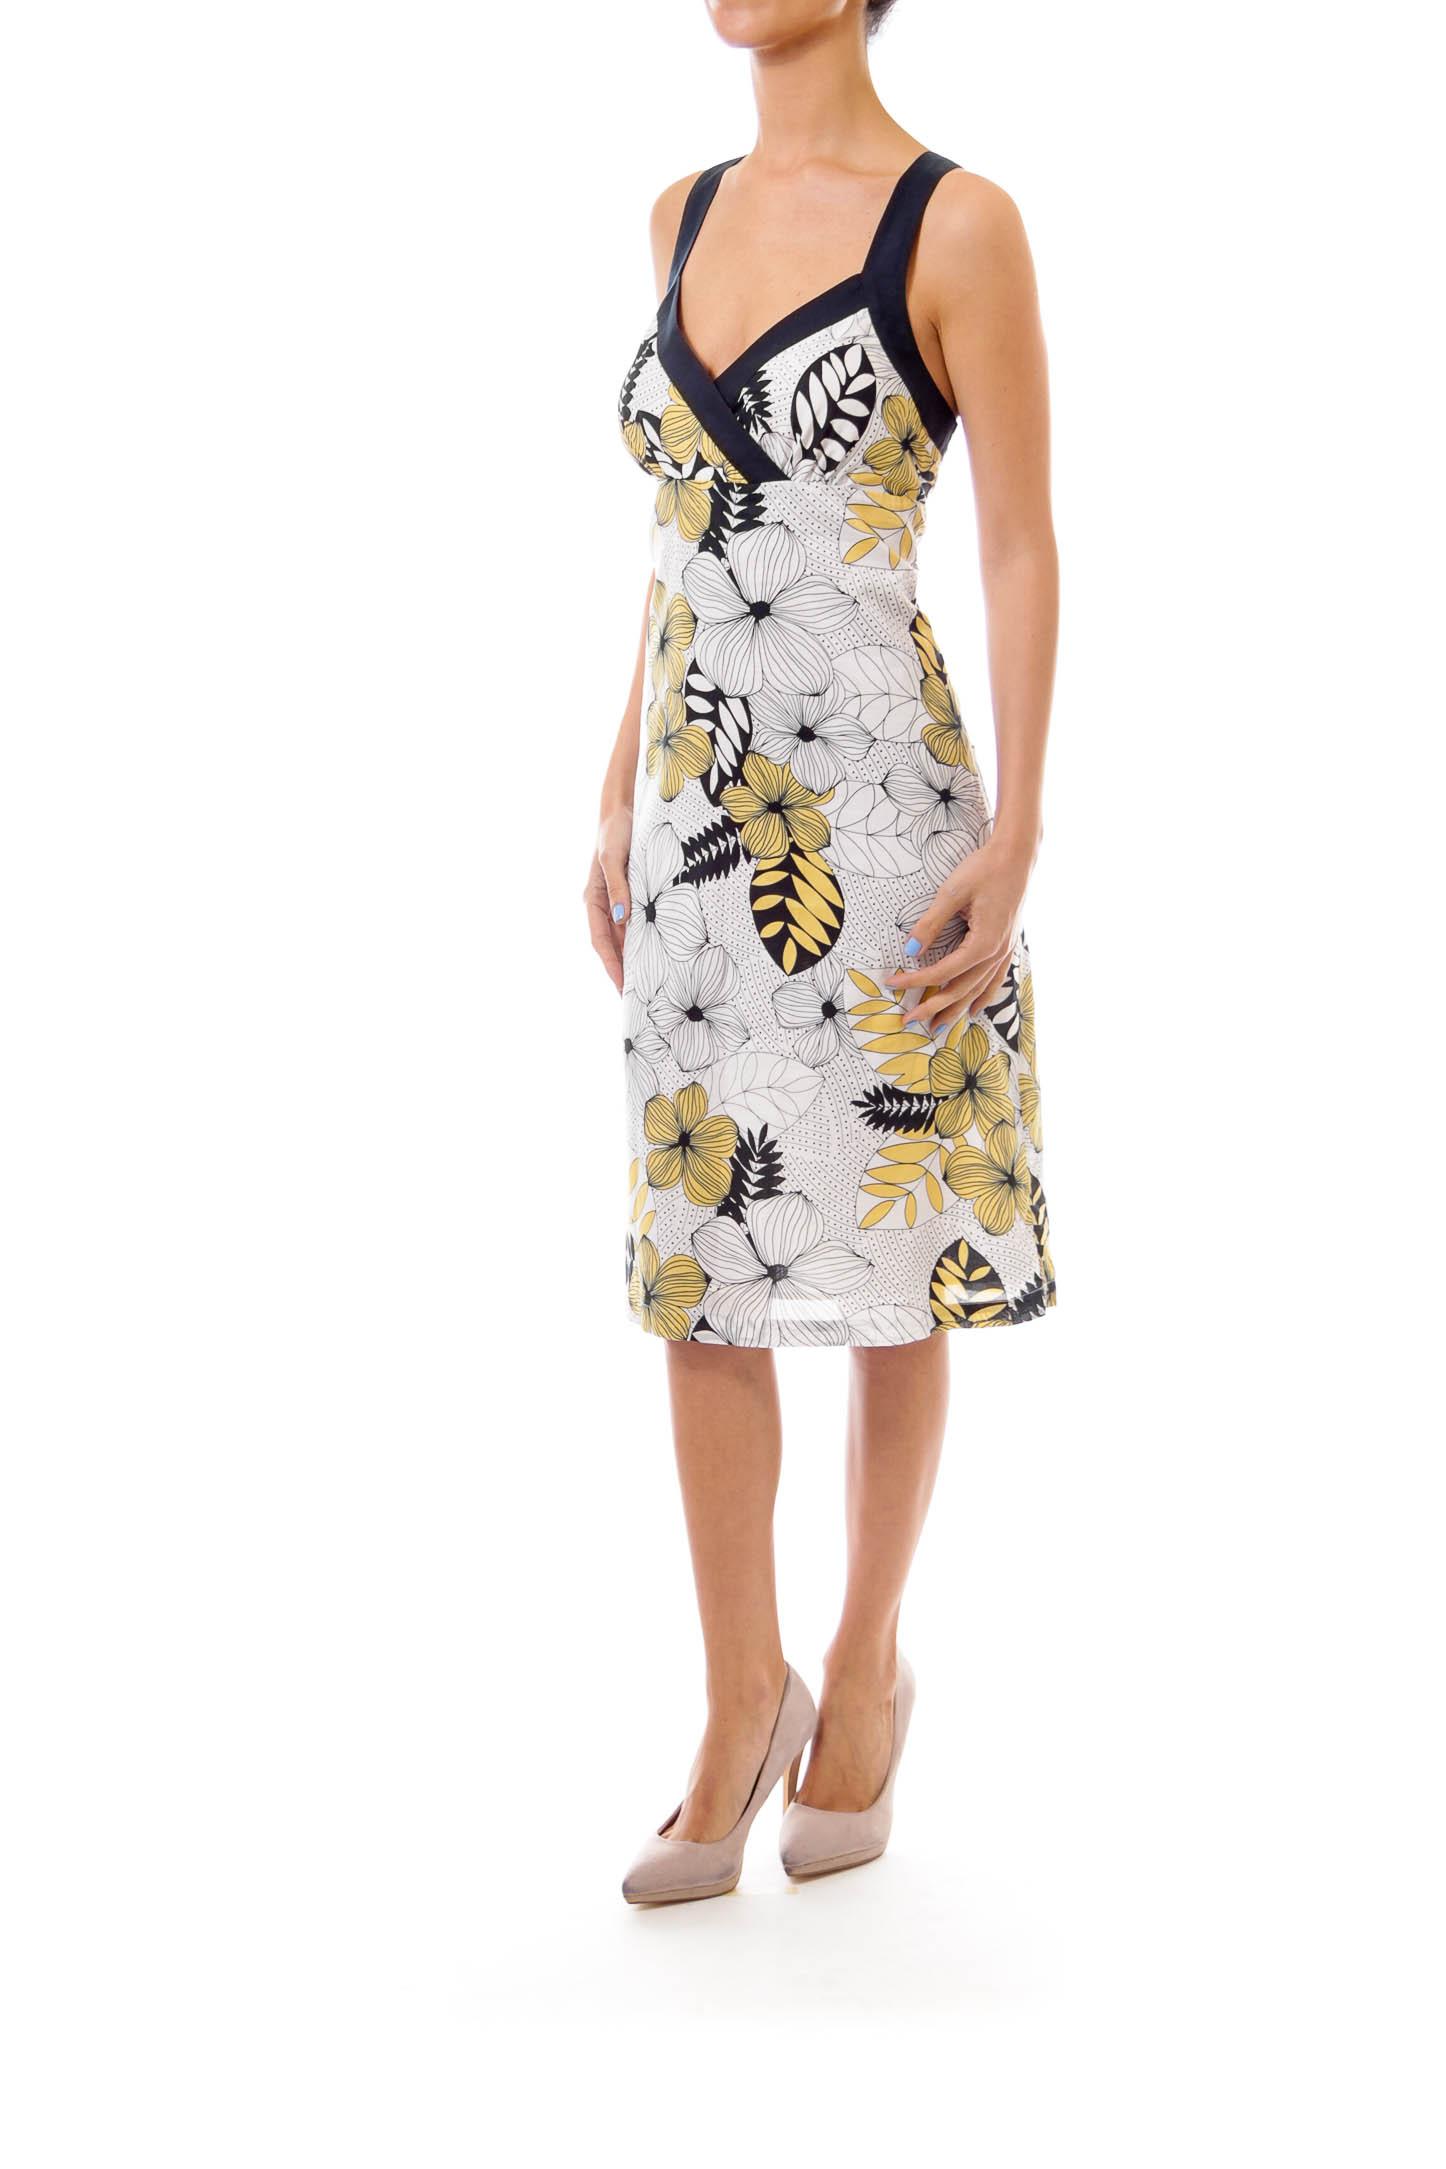 Black White & Yellow Sun Dress